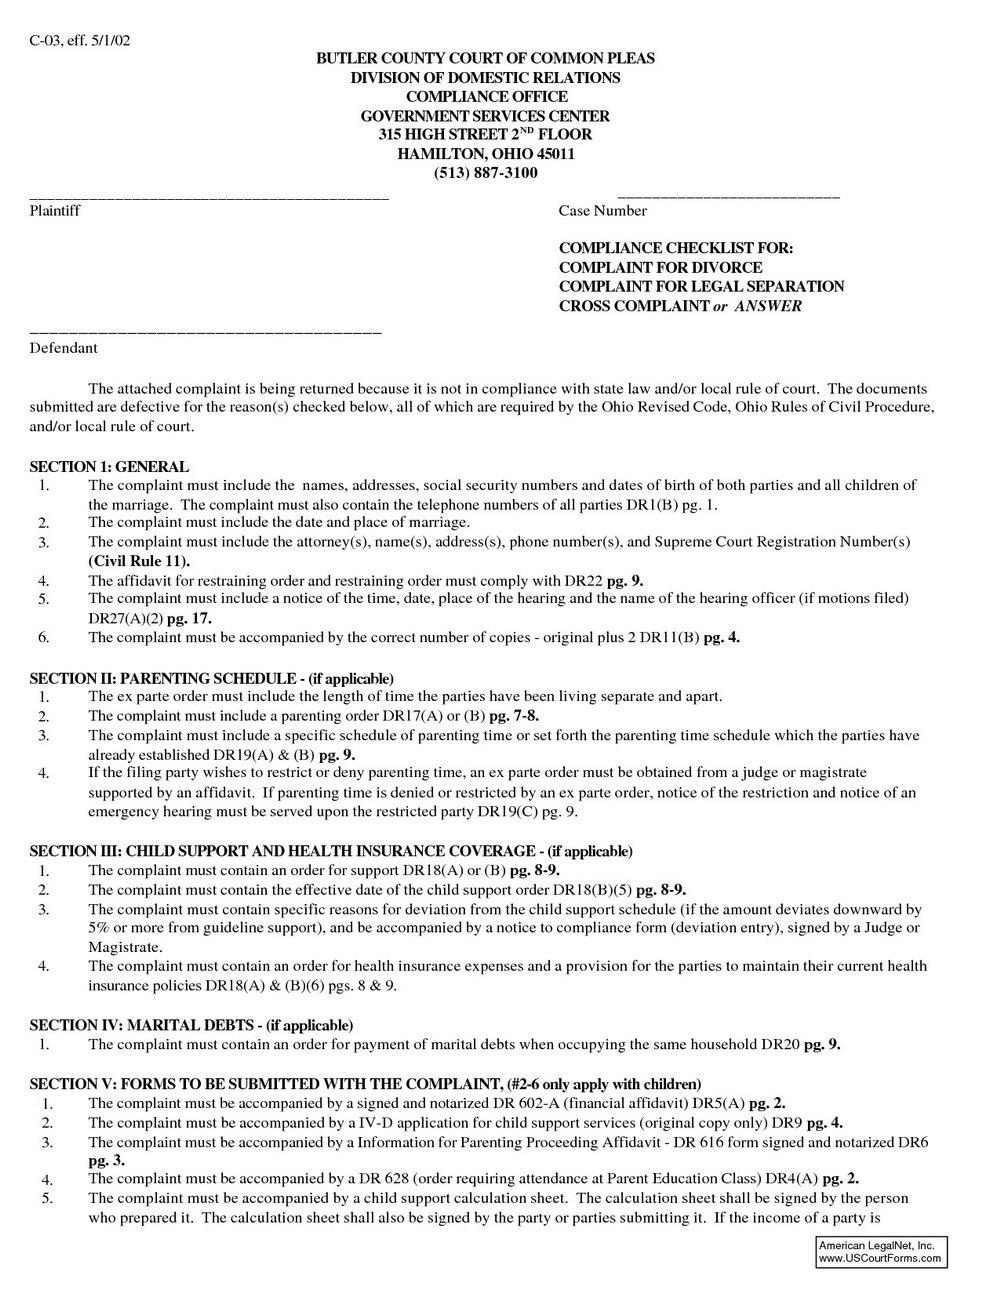 Ohio Legal Separation Forms